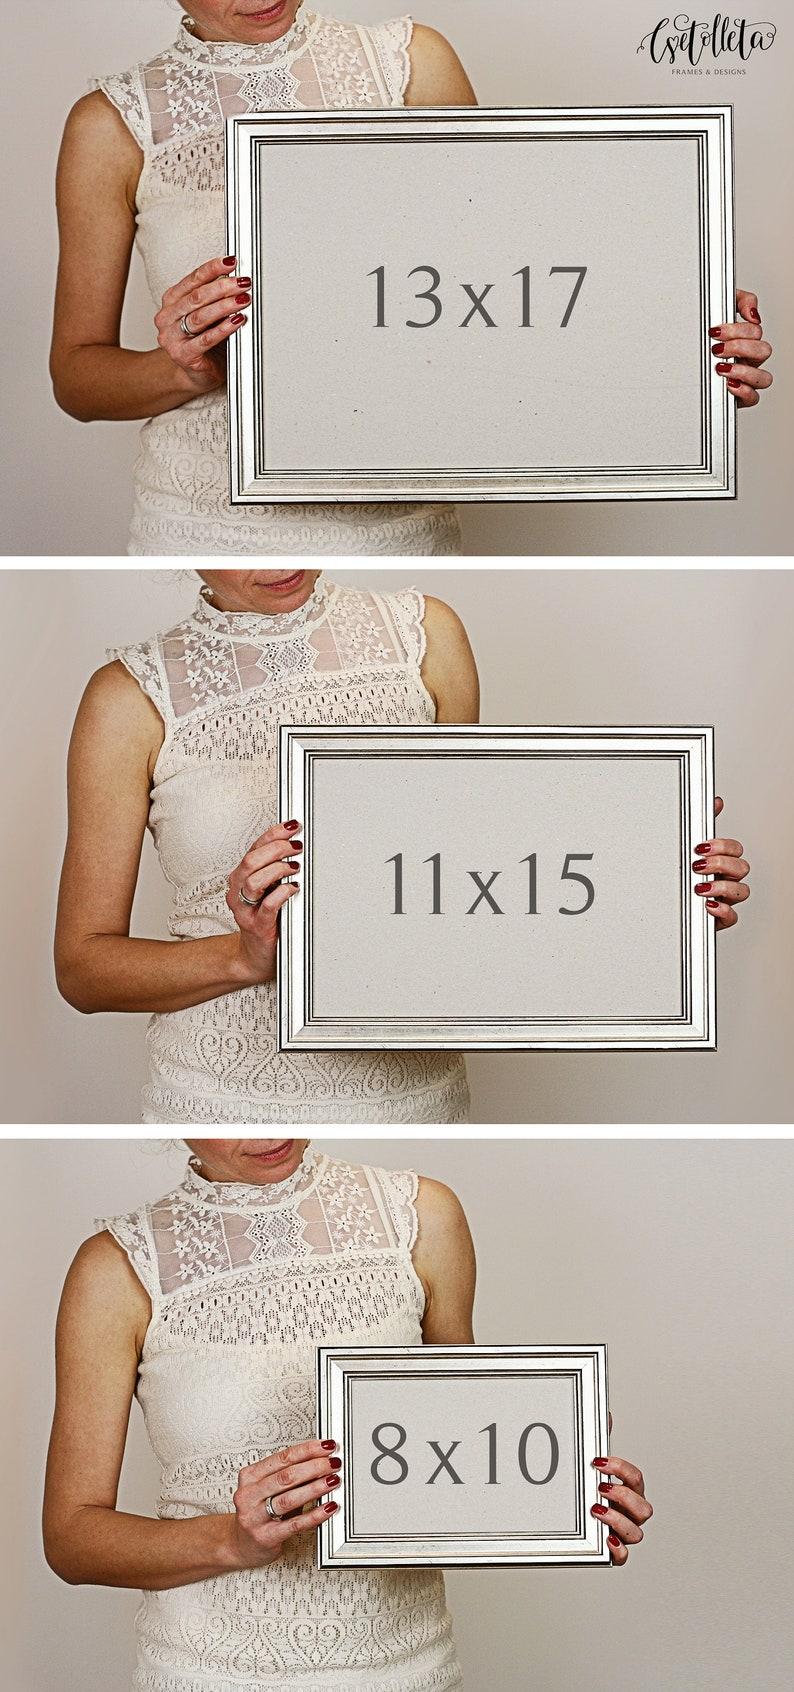 Wedding Frame For Sister Of The Bride